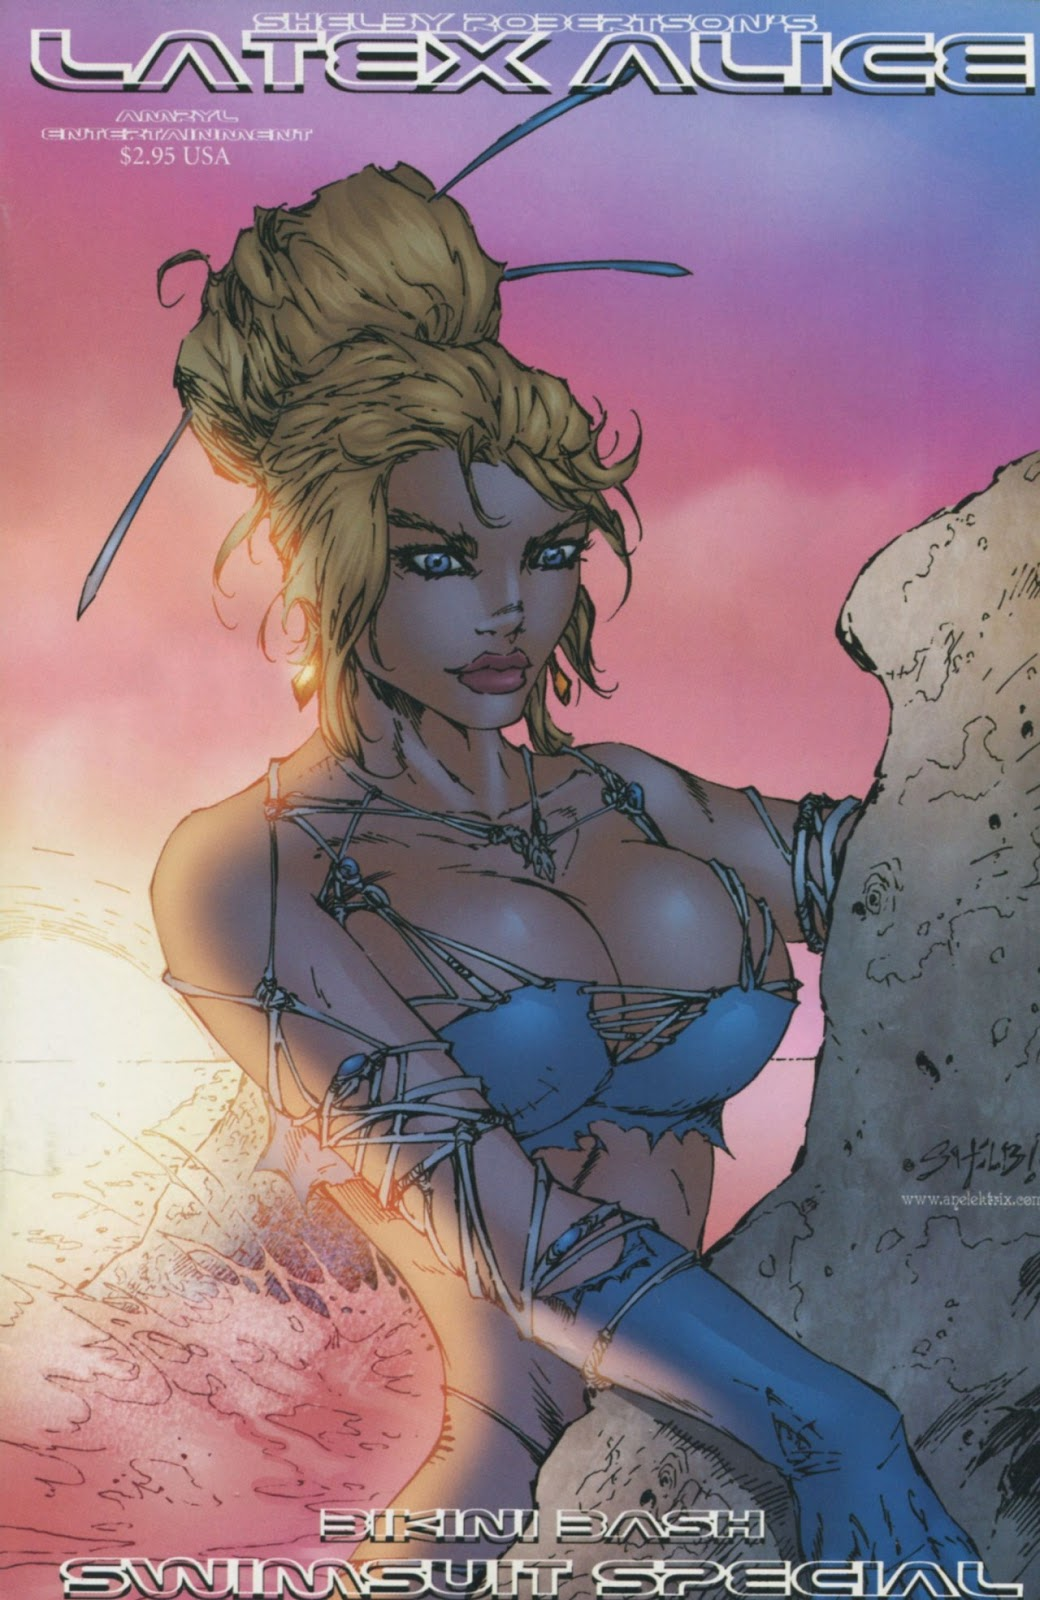 Read online Latex Alice - Bikini Bash Swimsuit Special comic -  Issue # Full - 1